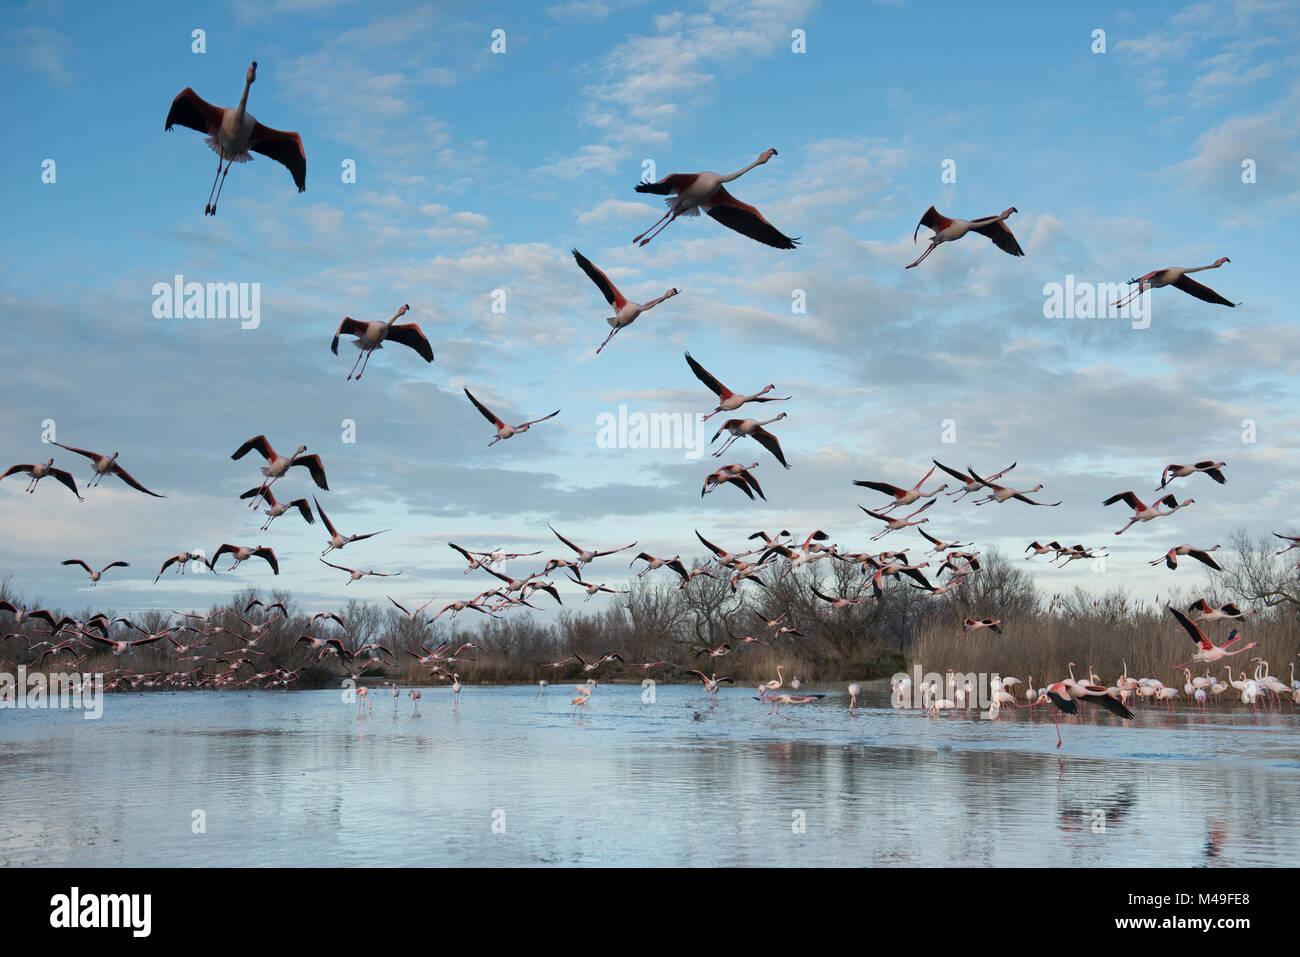 Greater flamingo (Phoenicopterus ruber) flock in flight, Pont de Gau Ornithological Park, Camargue, France, March - Stock Image